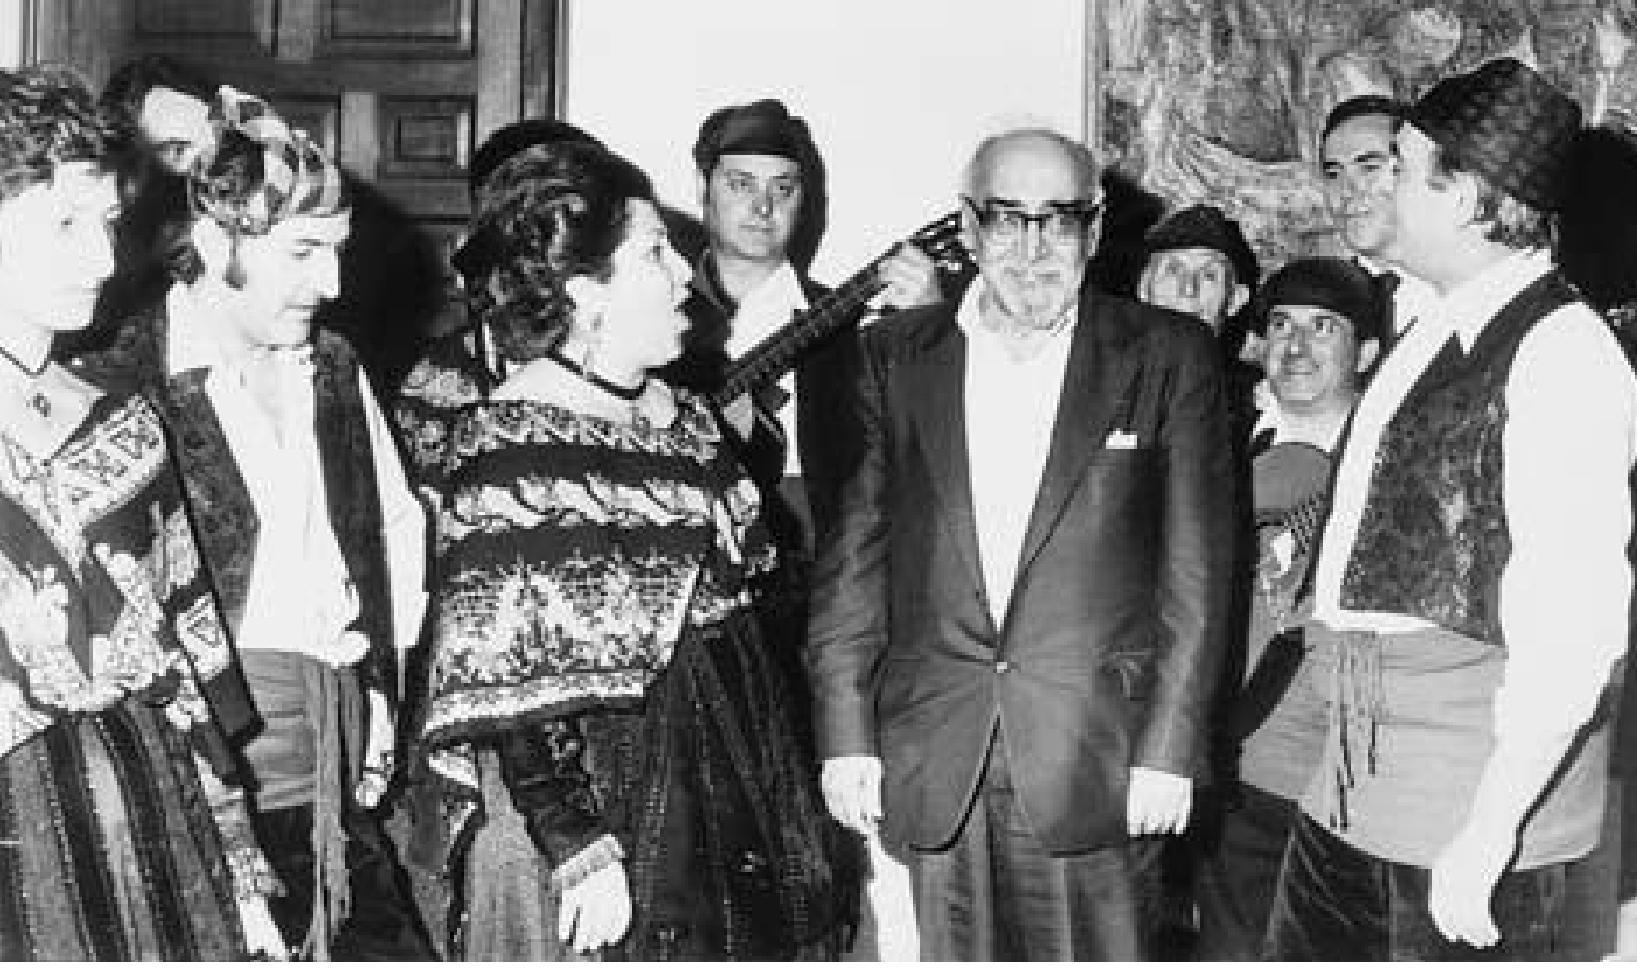 Homenaje jotero a Sender en Zaragoza 1974